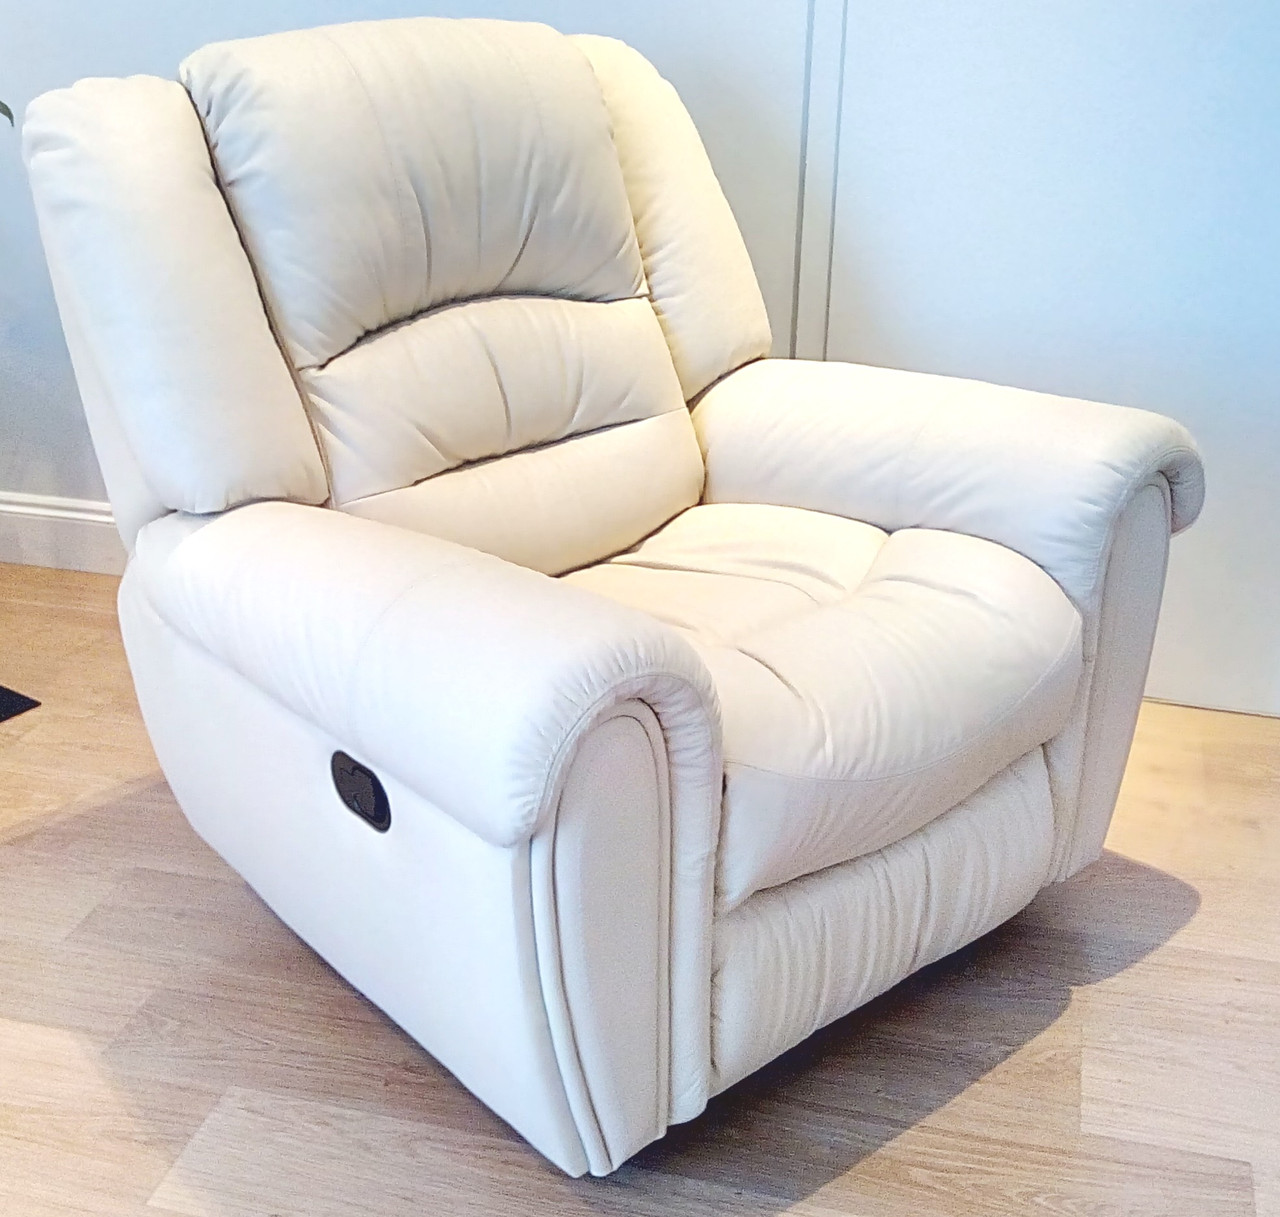 SPA Кресло реклайнер для салона красоты SHEFFIELD - МЕХАНИКА Купить